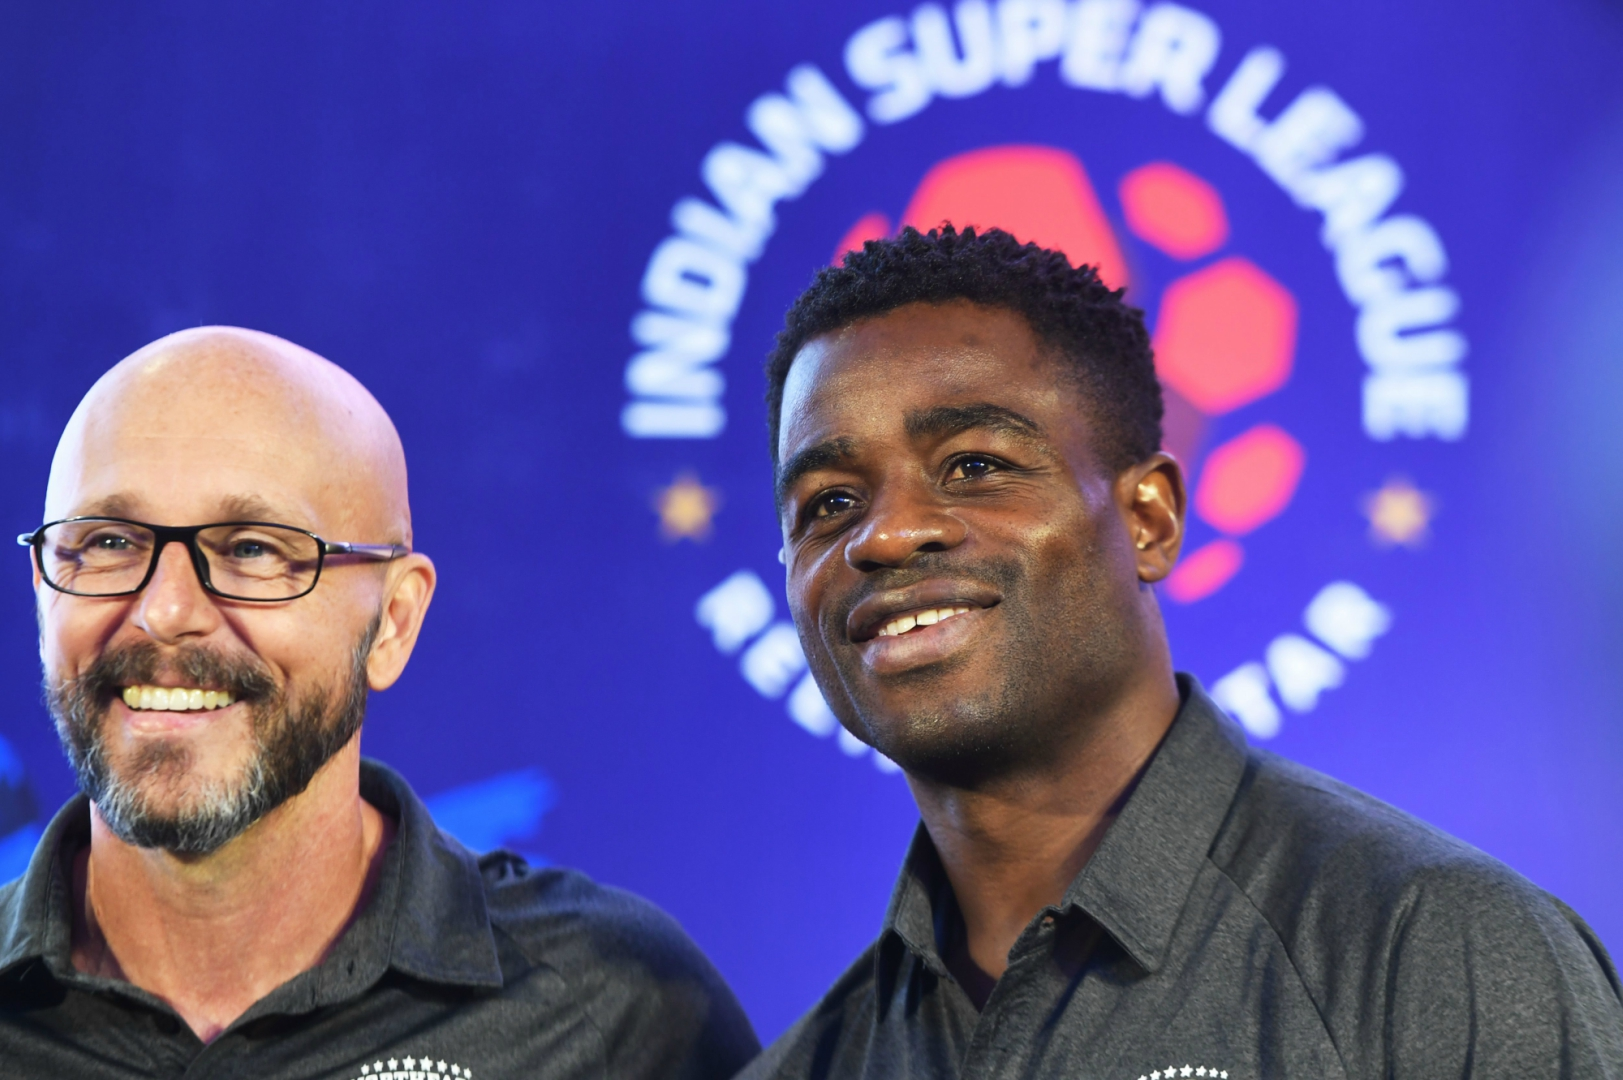 ISL: Kerala Blasters likely to sign NorthEast United star Bartholomew Ogbeche